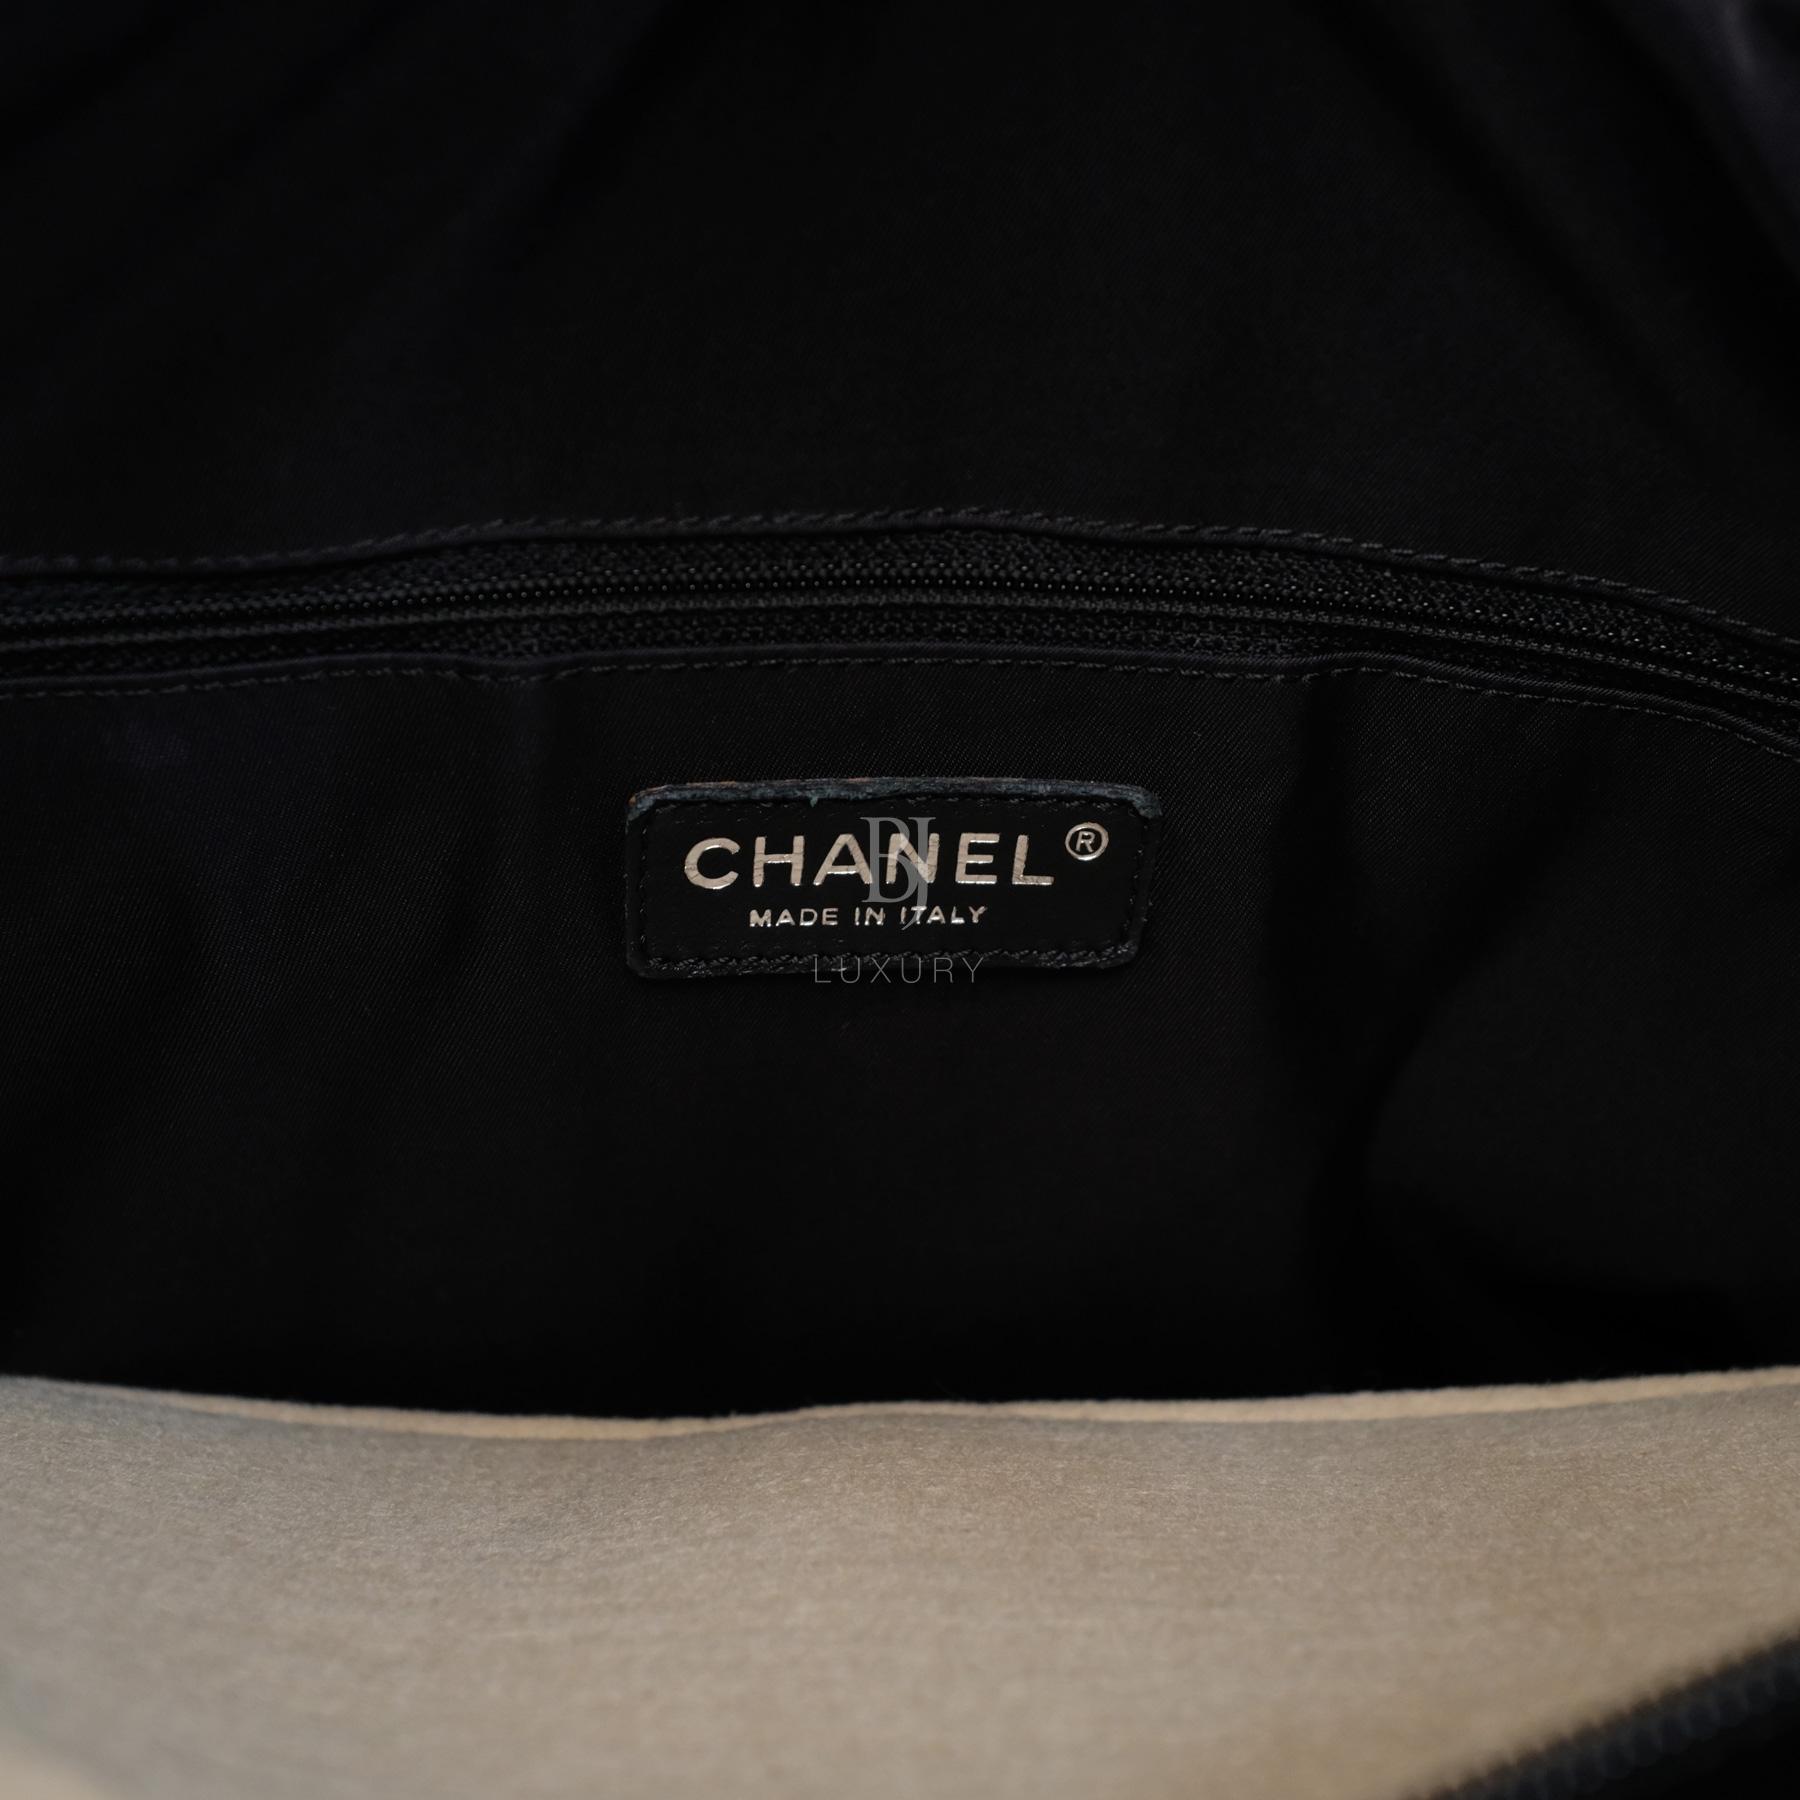 CHANEL-TOTE-MEDIUM-BLACK-CANVAS-DSCF7323.jpg